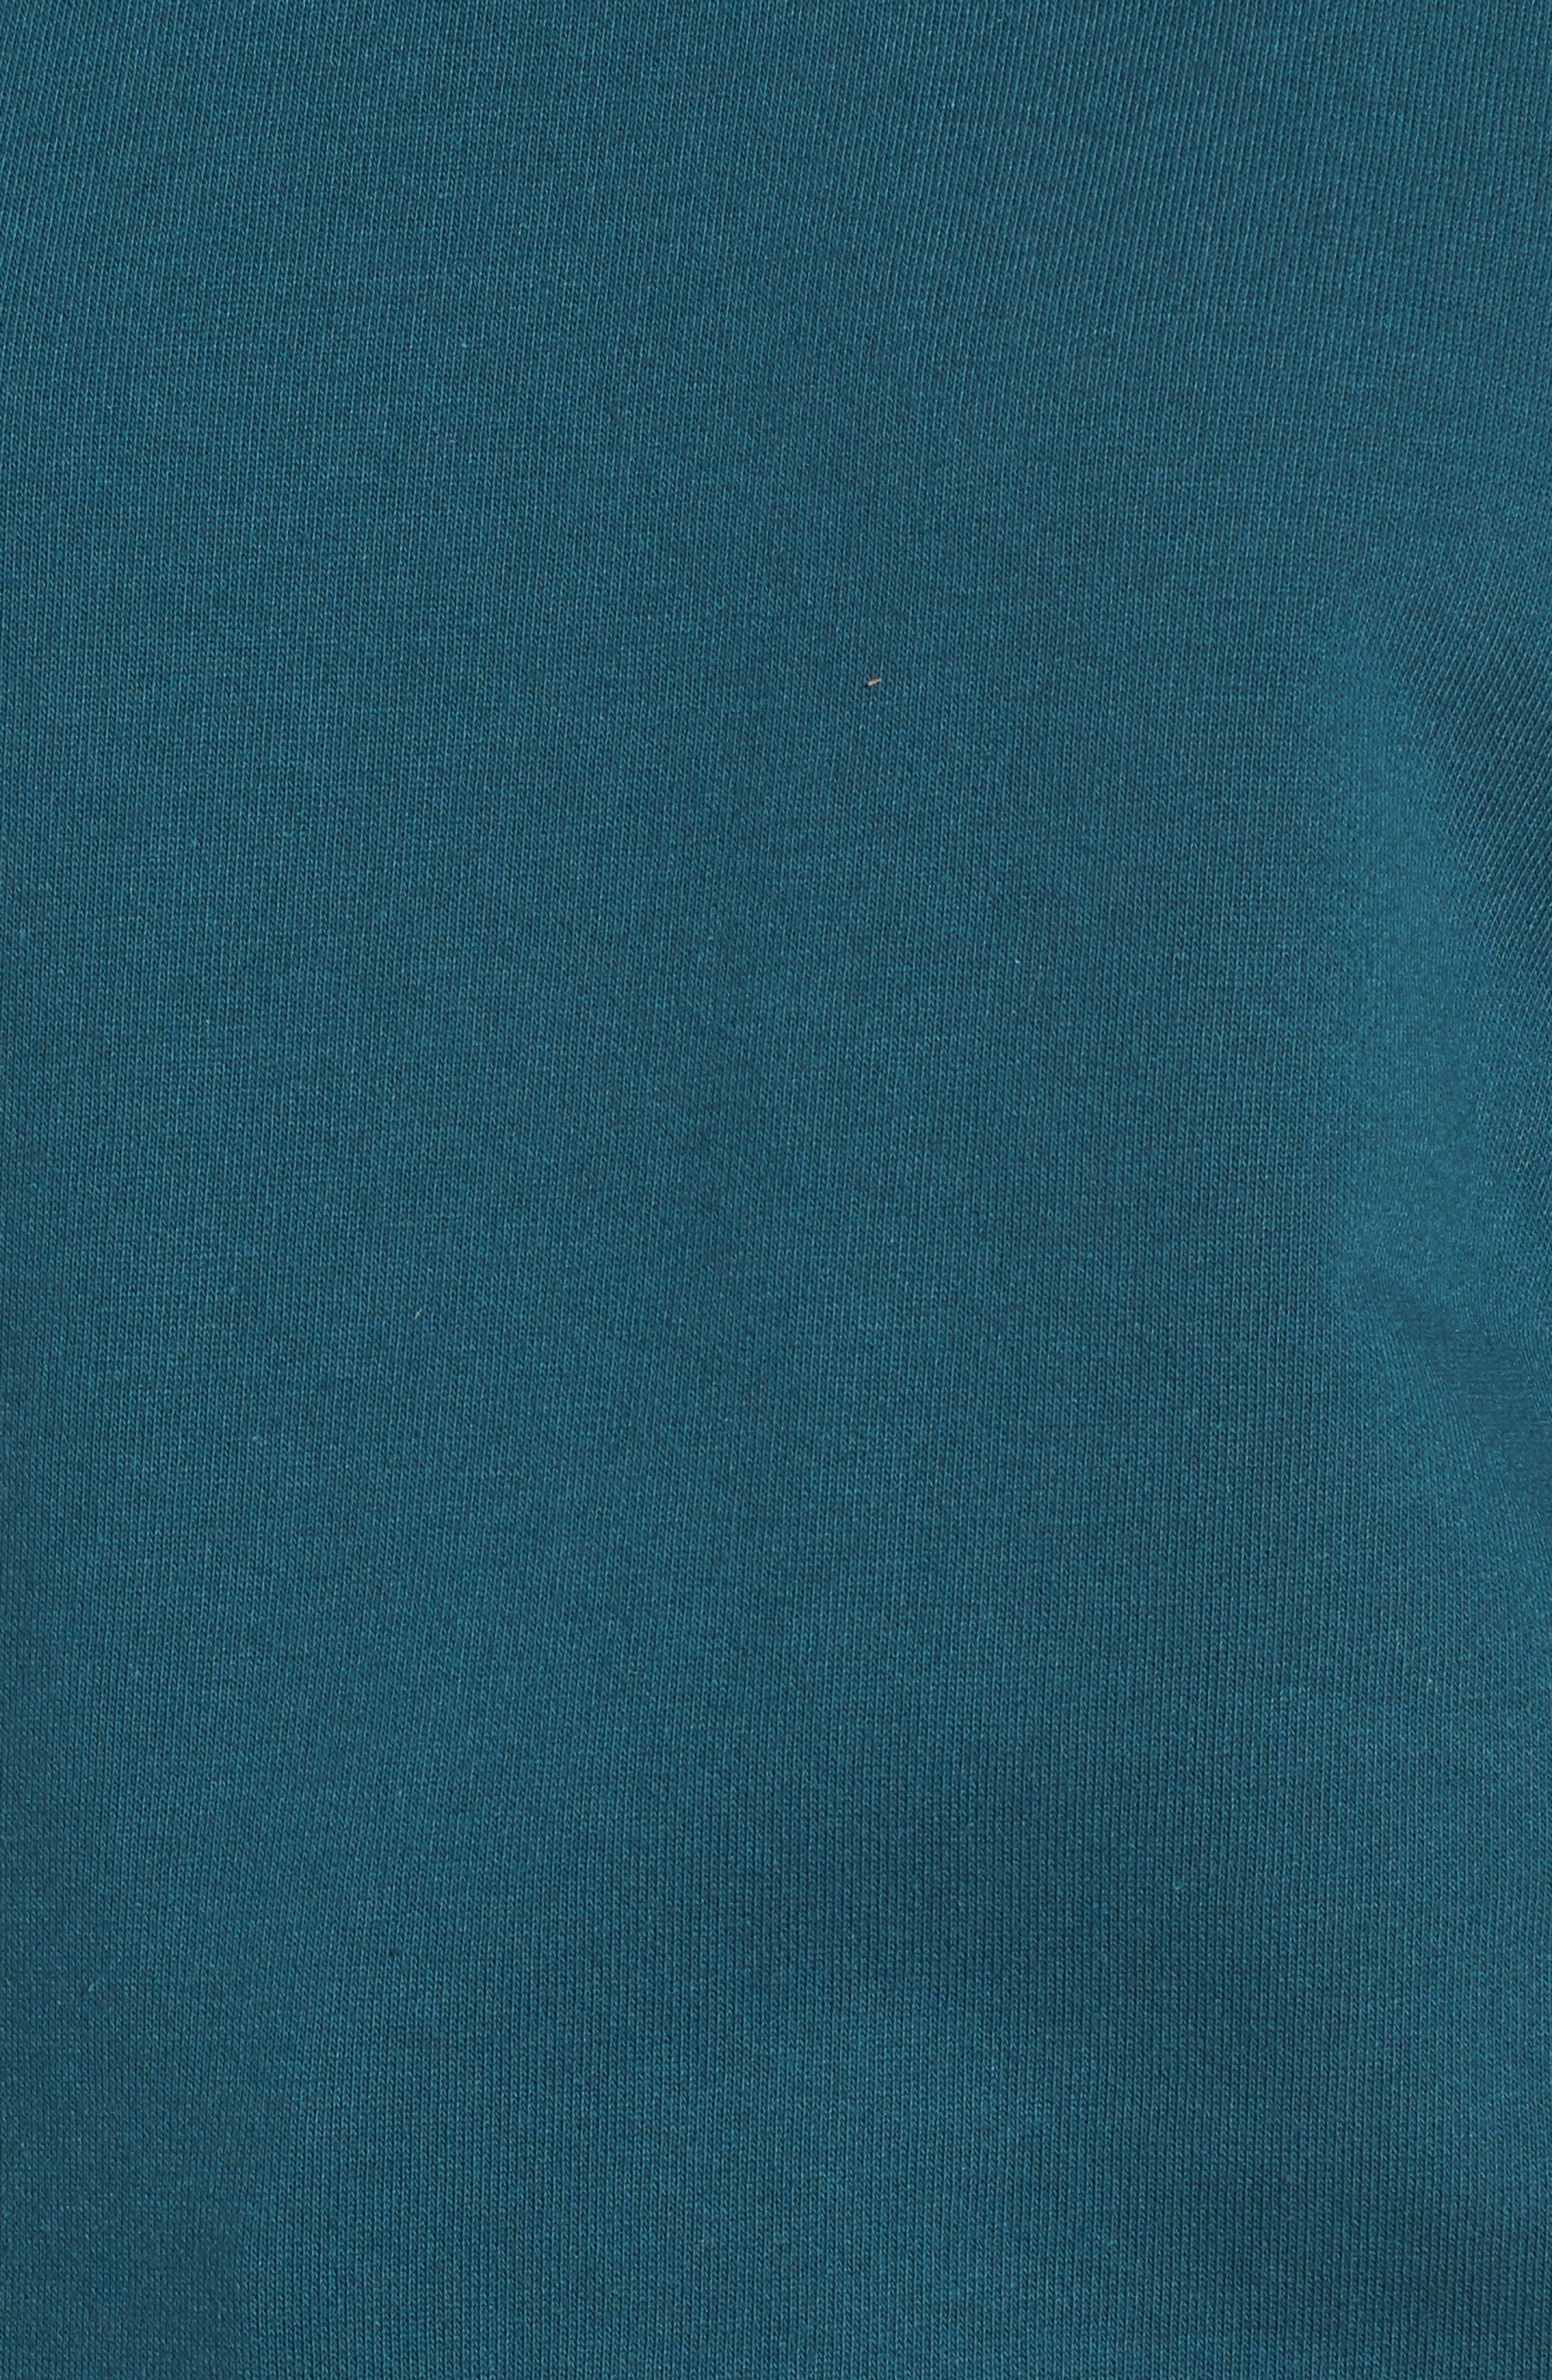 Cinched Sleeve Sweatshirt,                             Alternate thumbnail 5, color,                             440